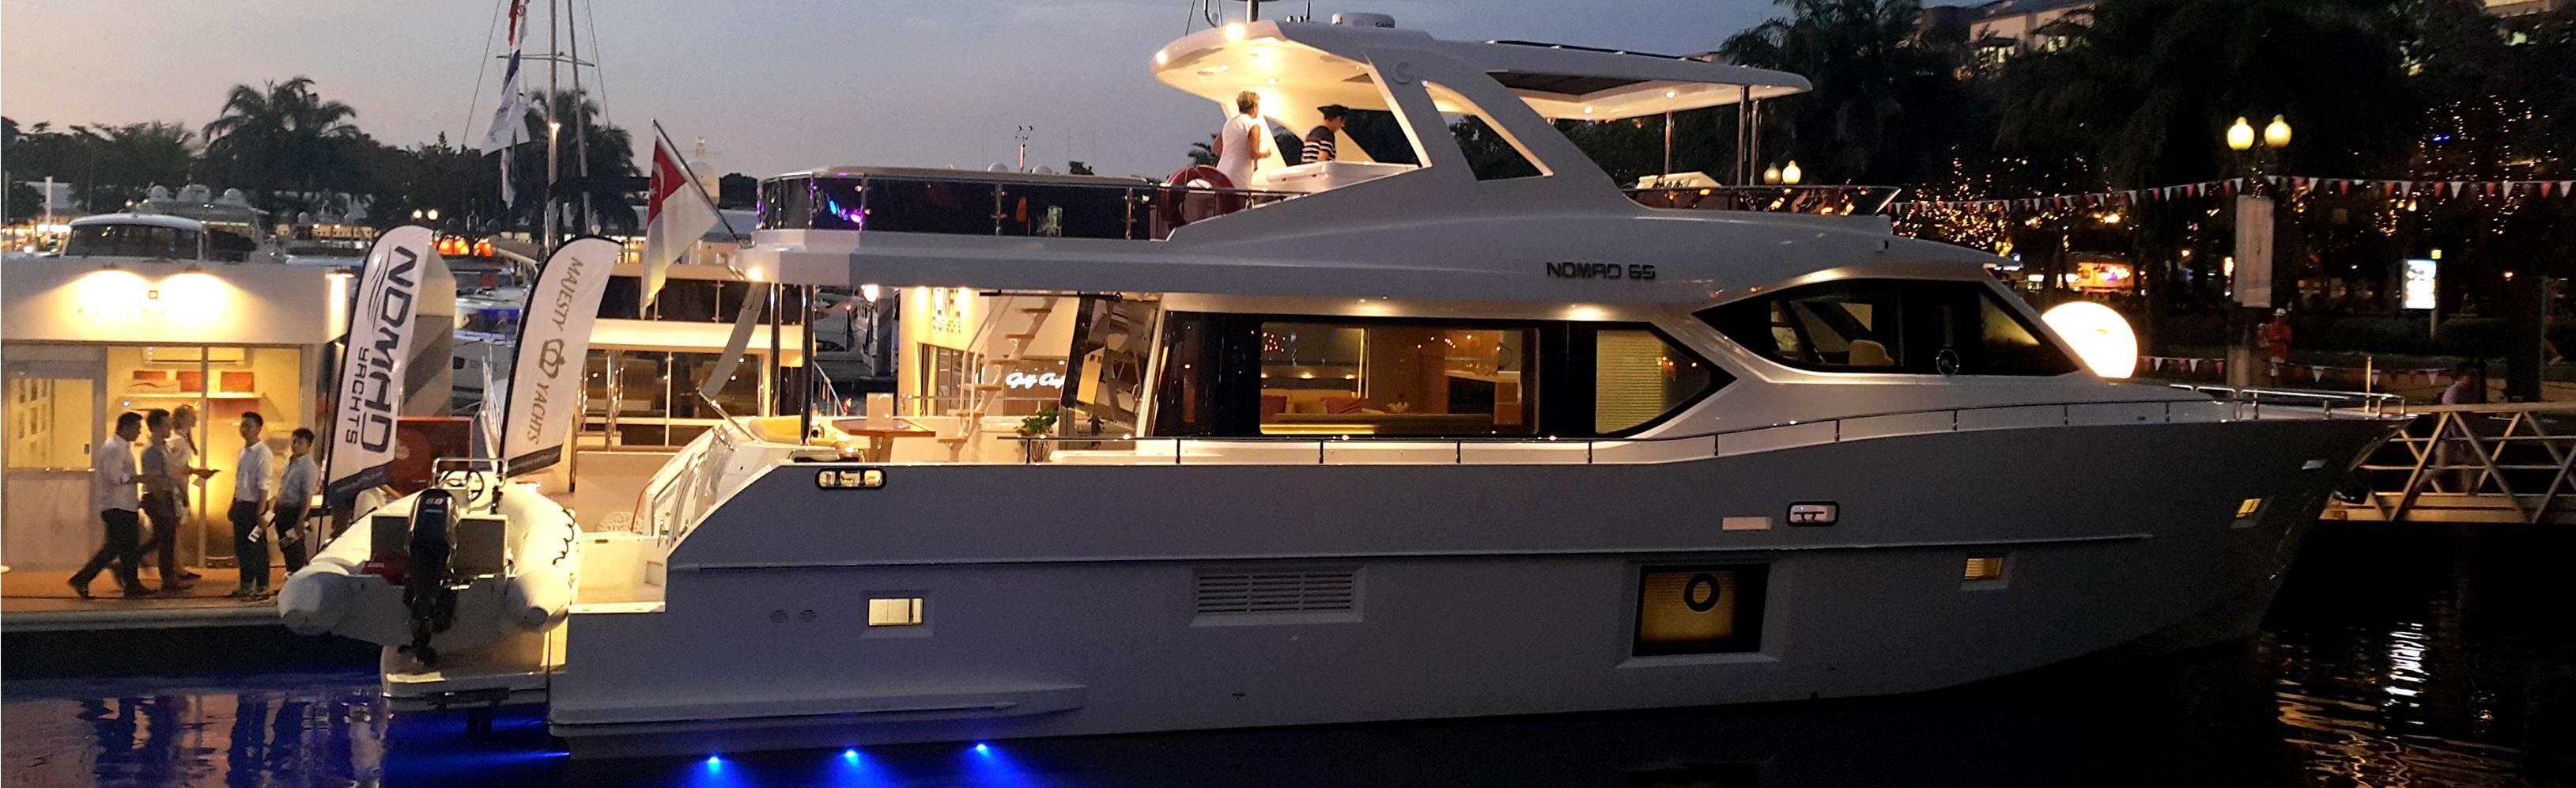 Gulf-Craft,-Singapore-Yacht-Show-Day-2.jpg